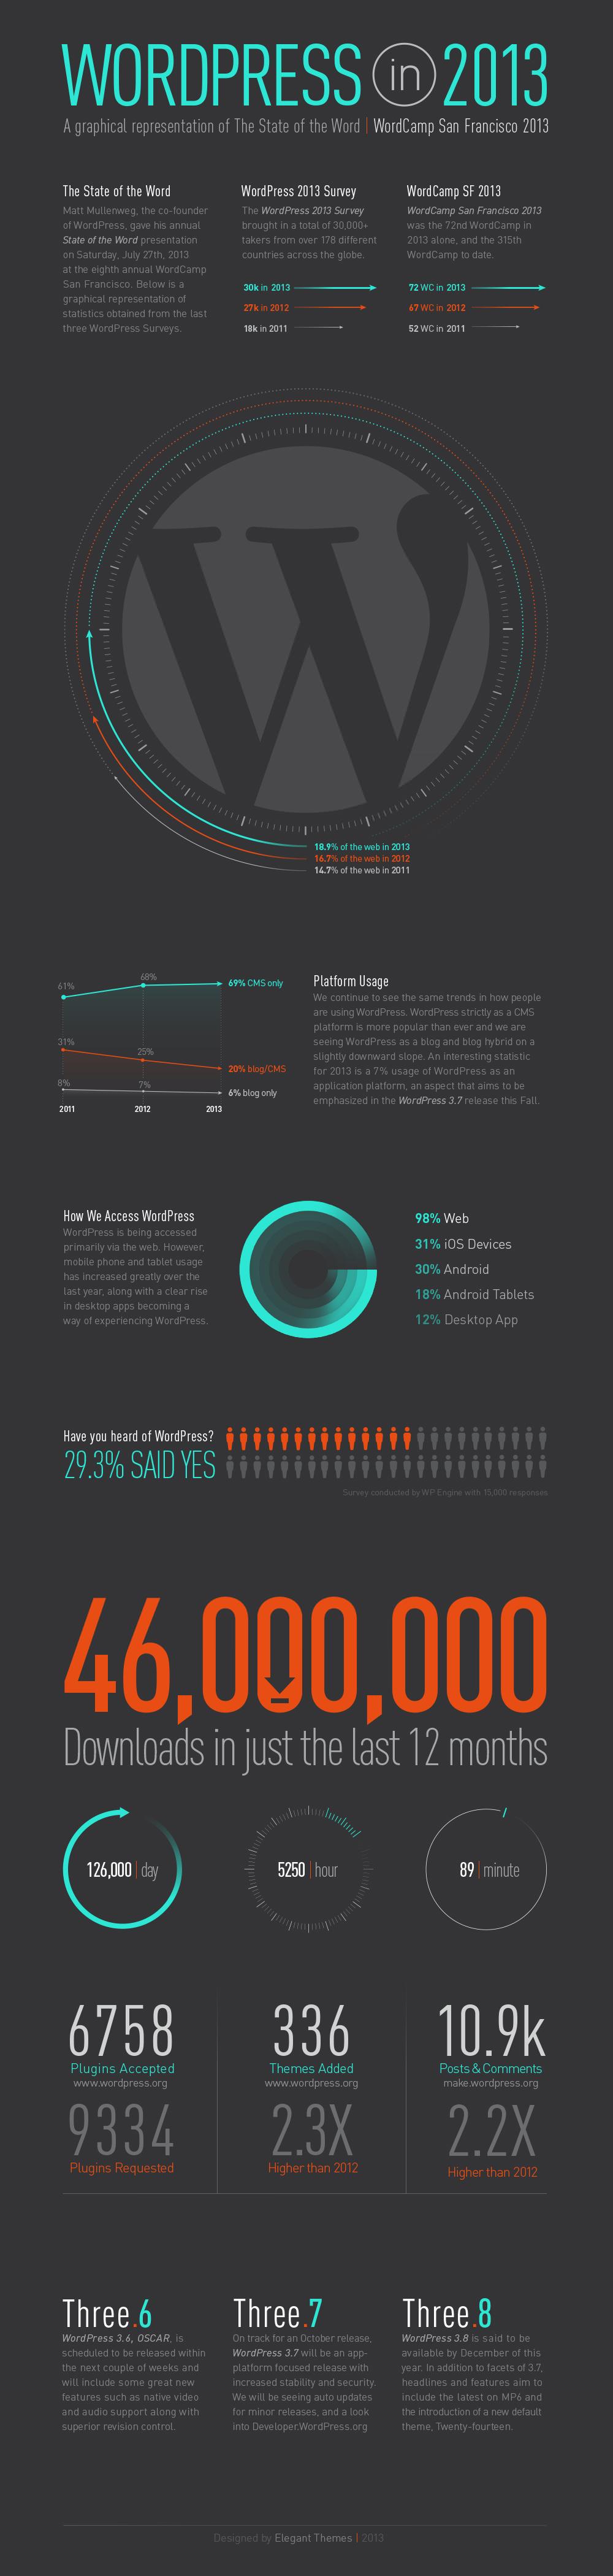 WordPress в 2013 - инфографика | n-wp.ru